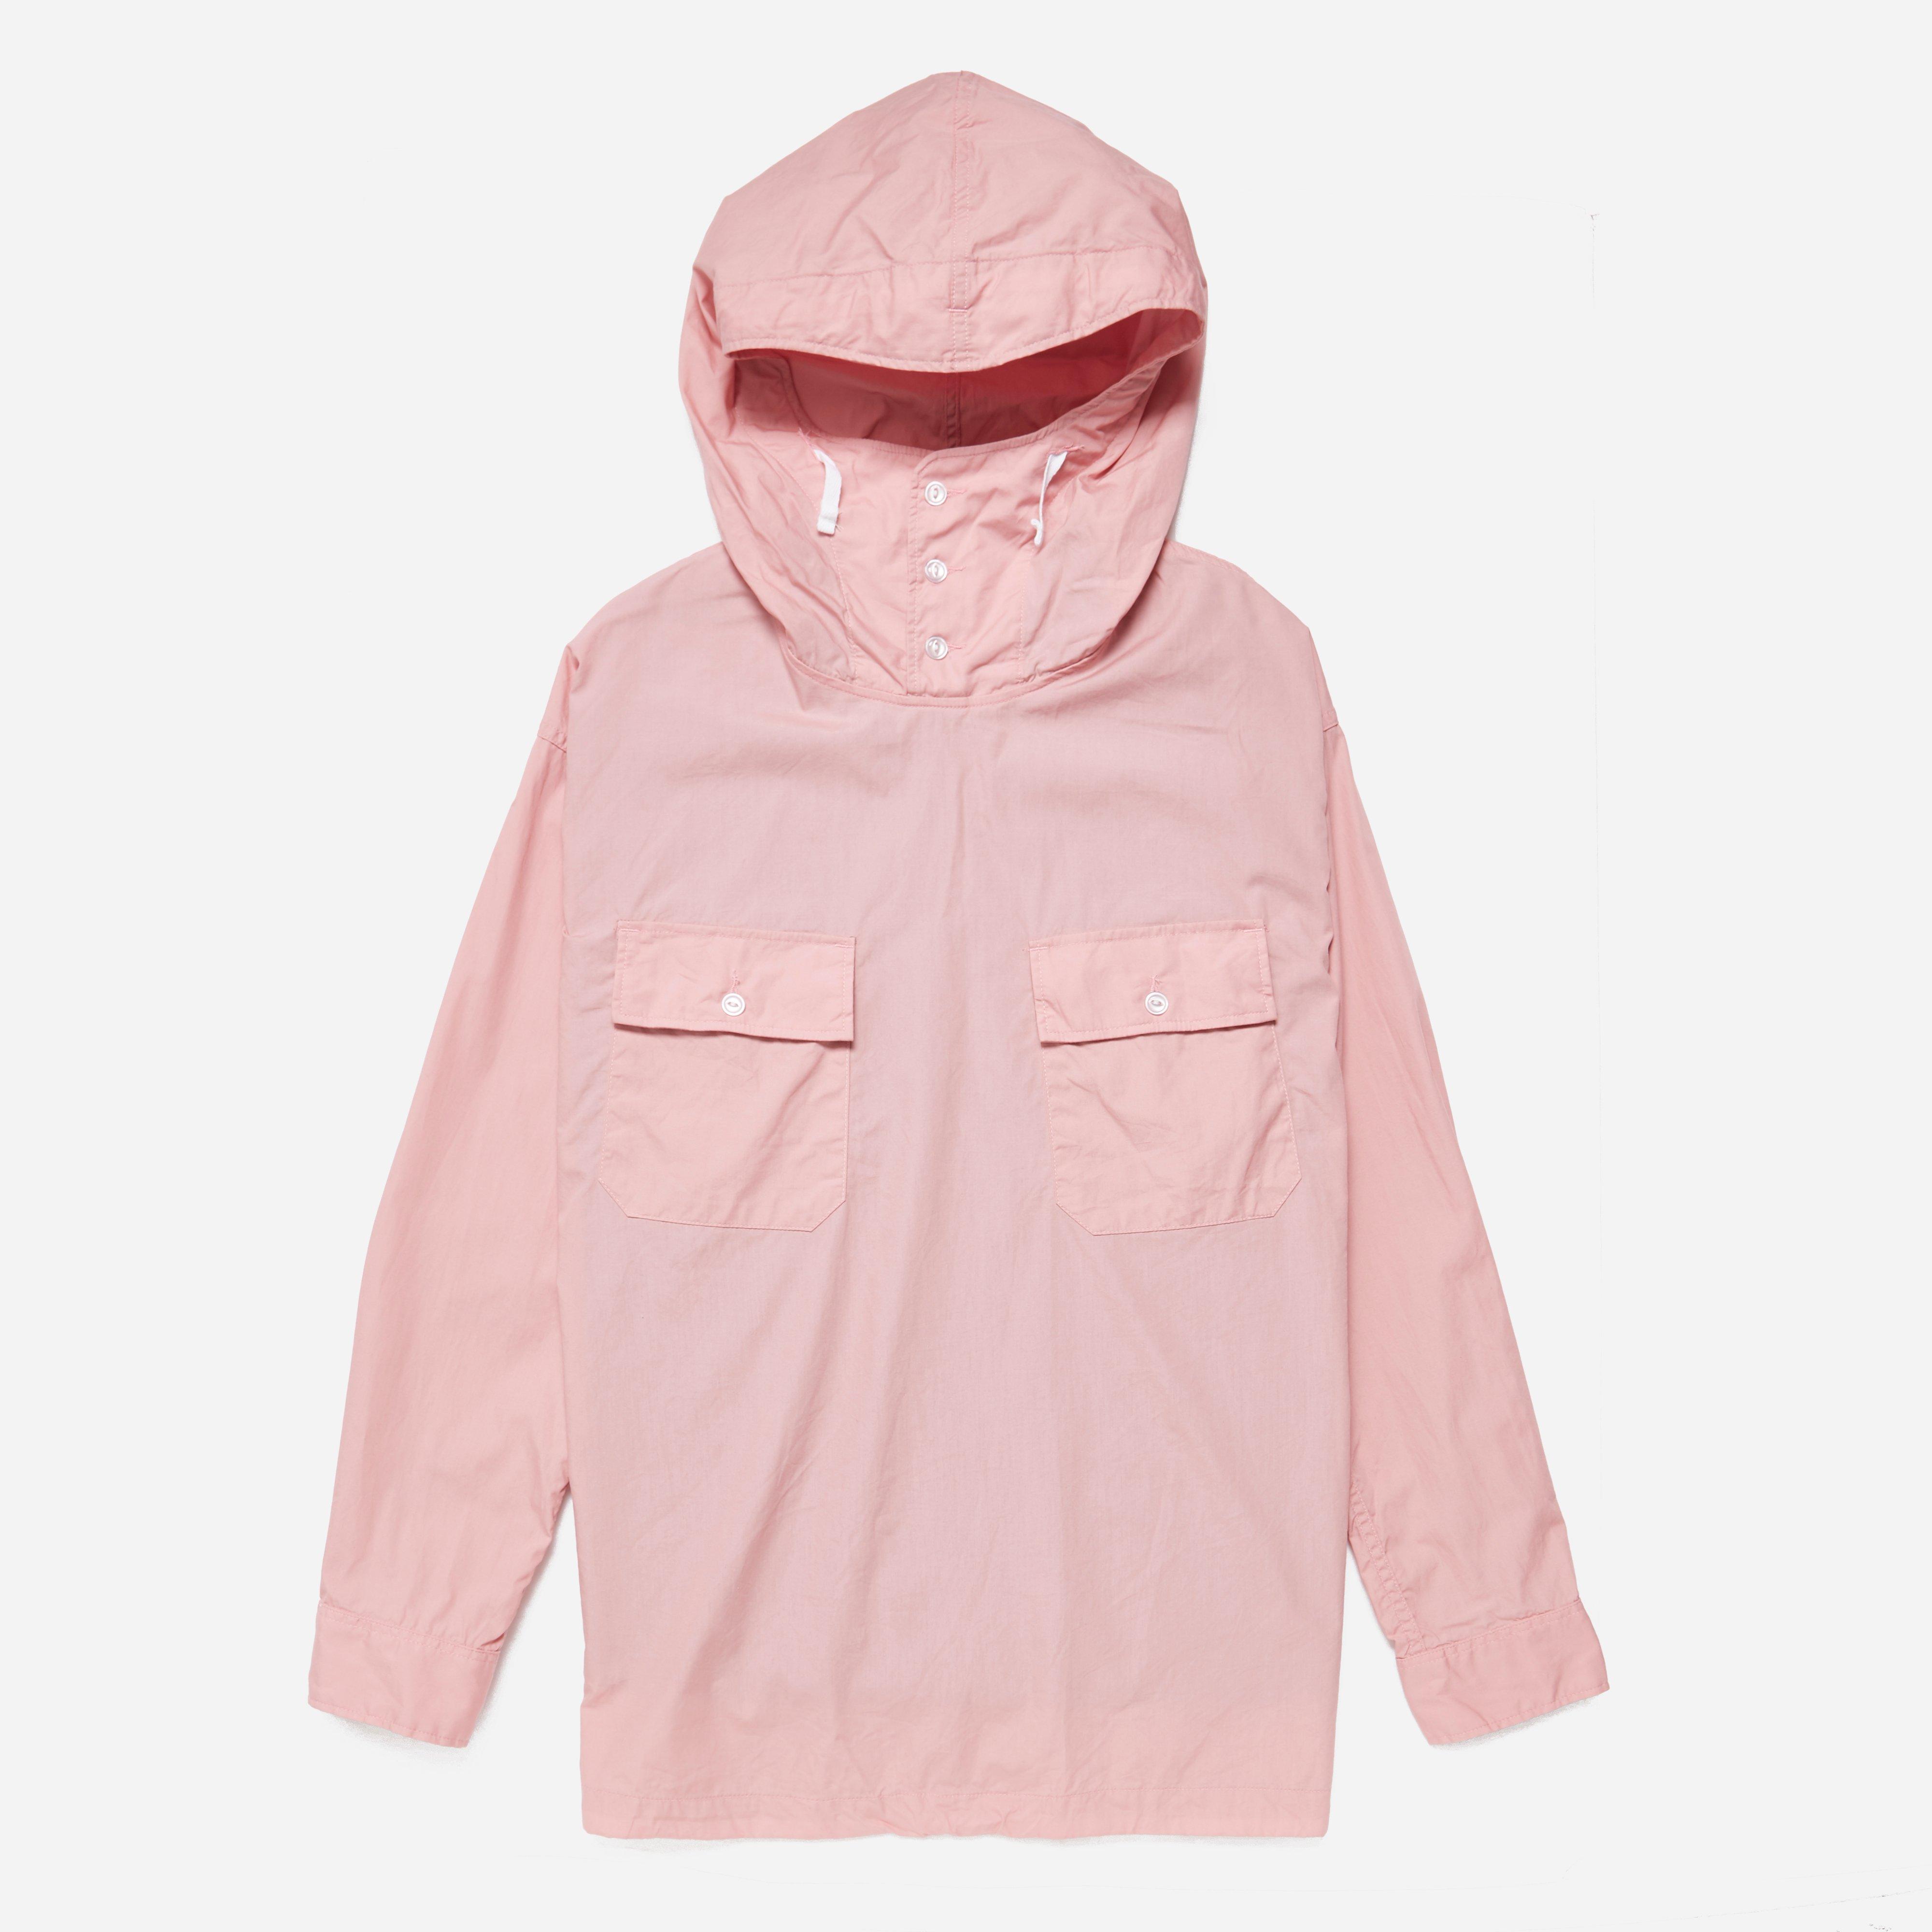 Engineered Garments Cagoule Shirt